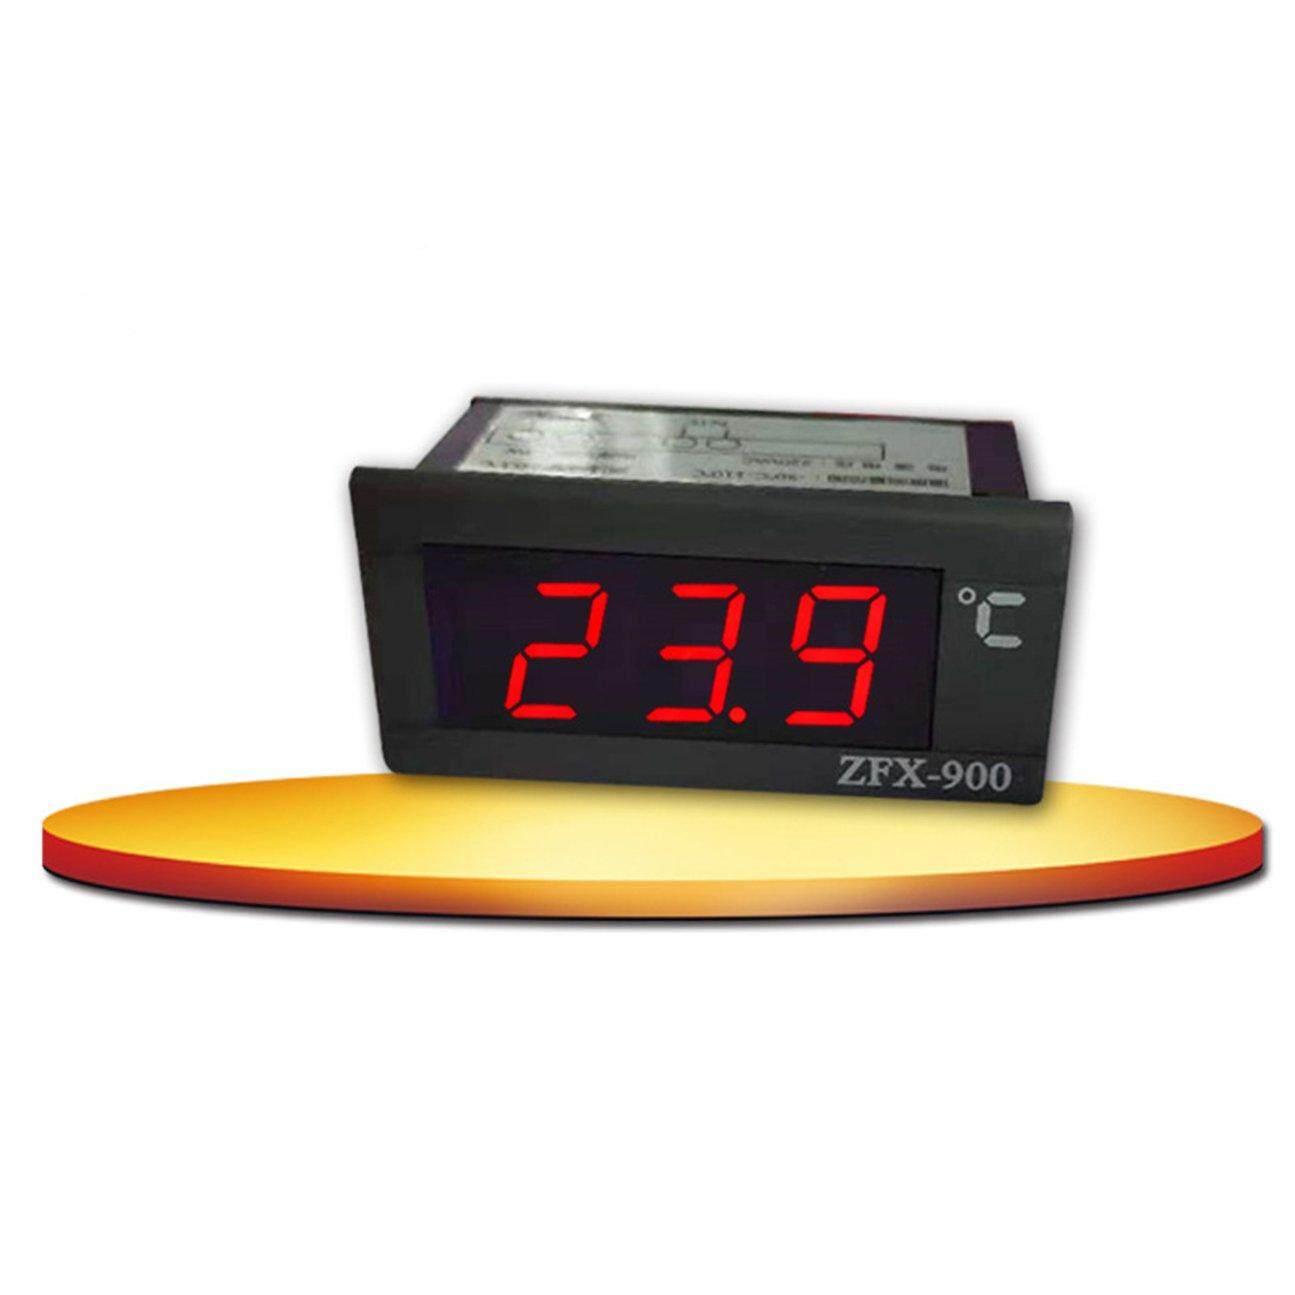 Super Deals ZFX-900 LED Display Digital Thermometer LED Temperature Monitor  Fridge Sensor